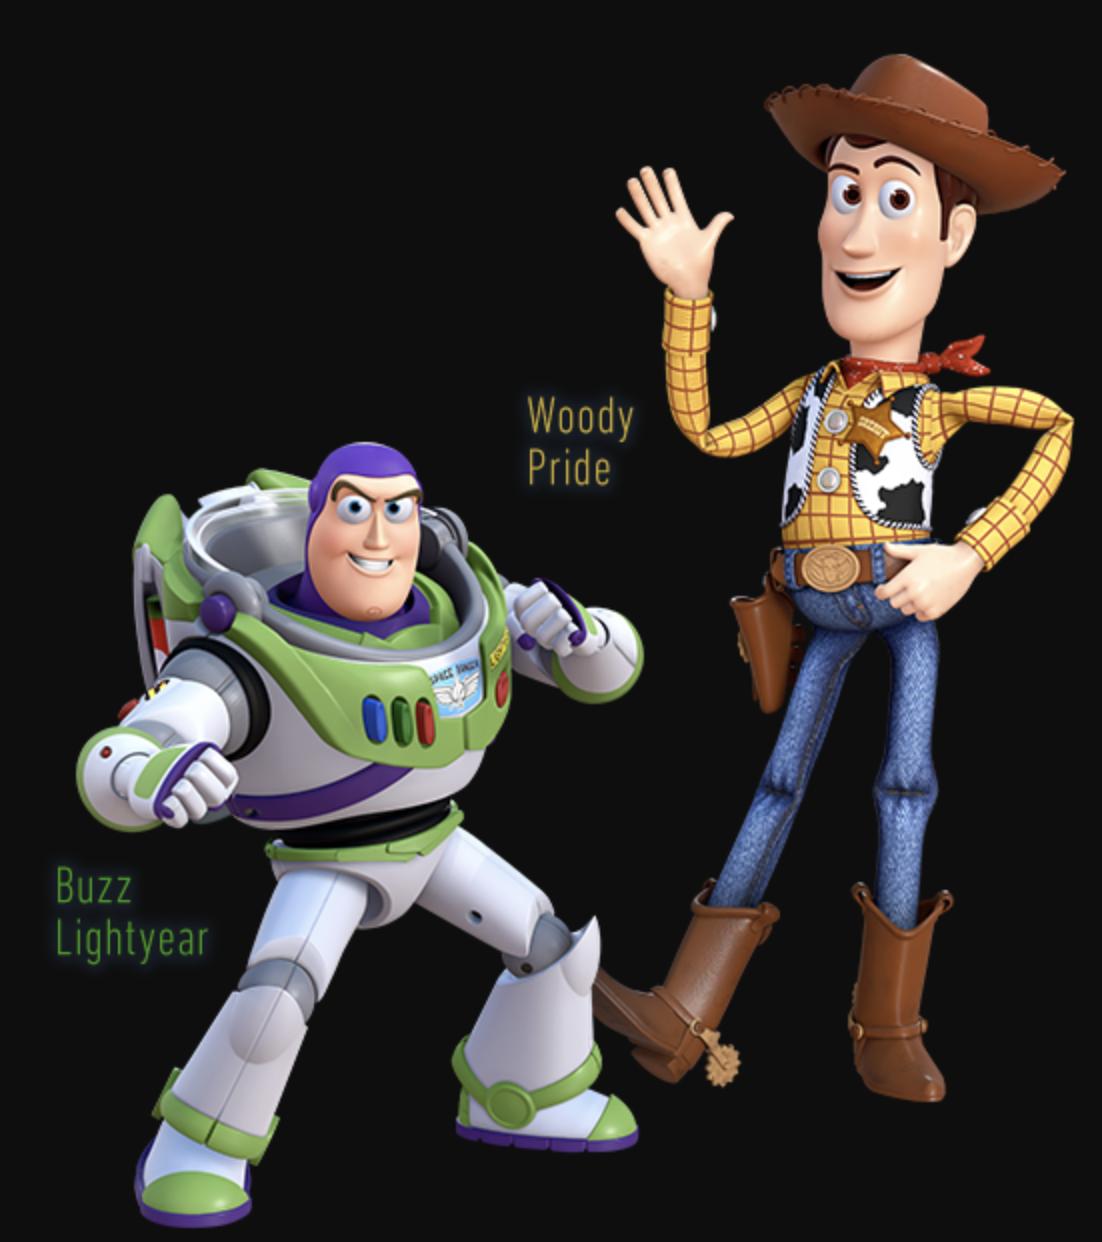 Kingdom Hearts Woody